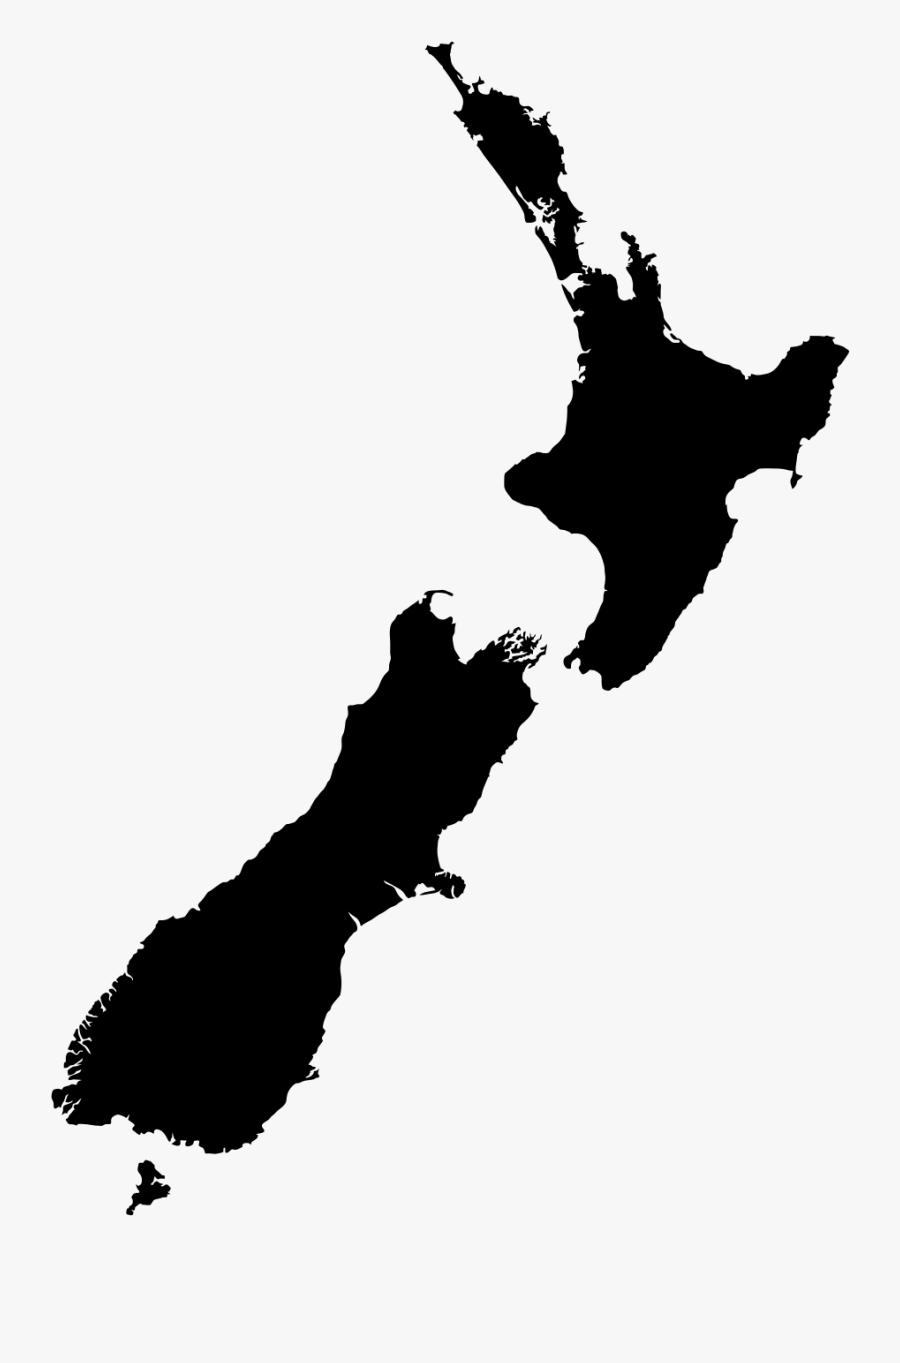 New Zealand Gdp Map, Transparent Clipart